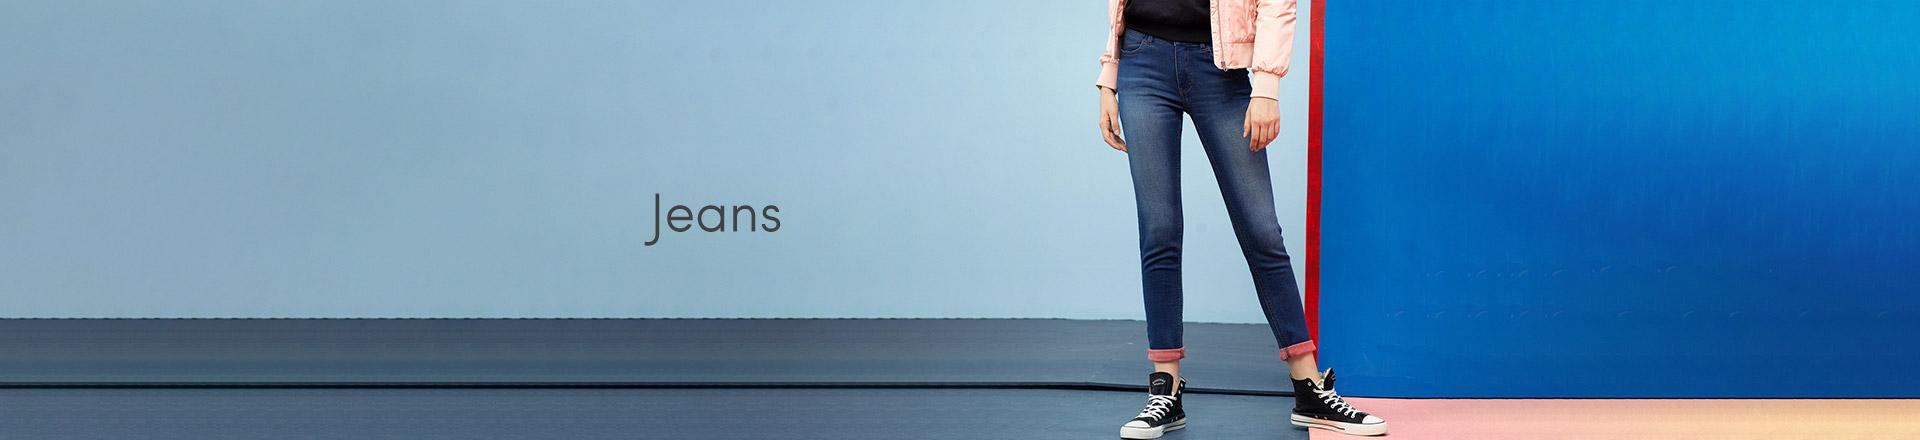 Women's L Women's Giordano Thailand Jeans rdeBoCx